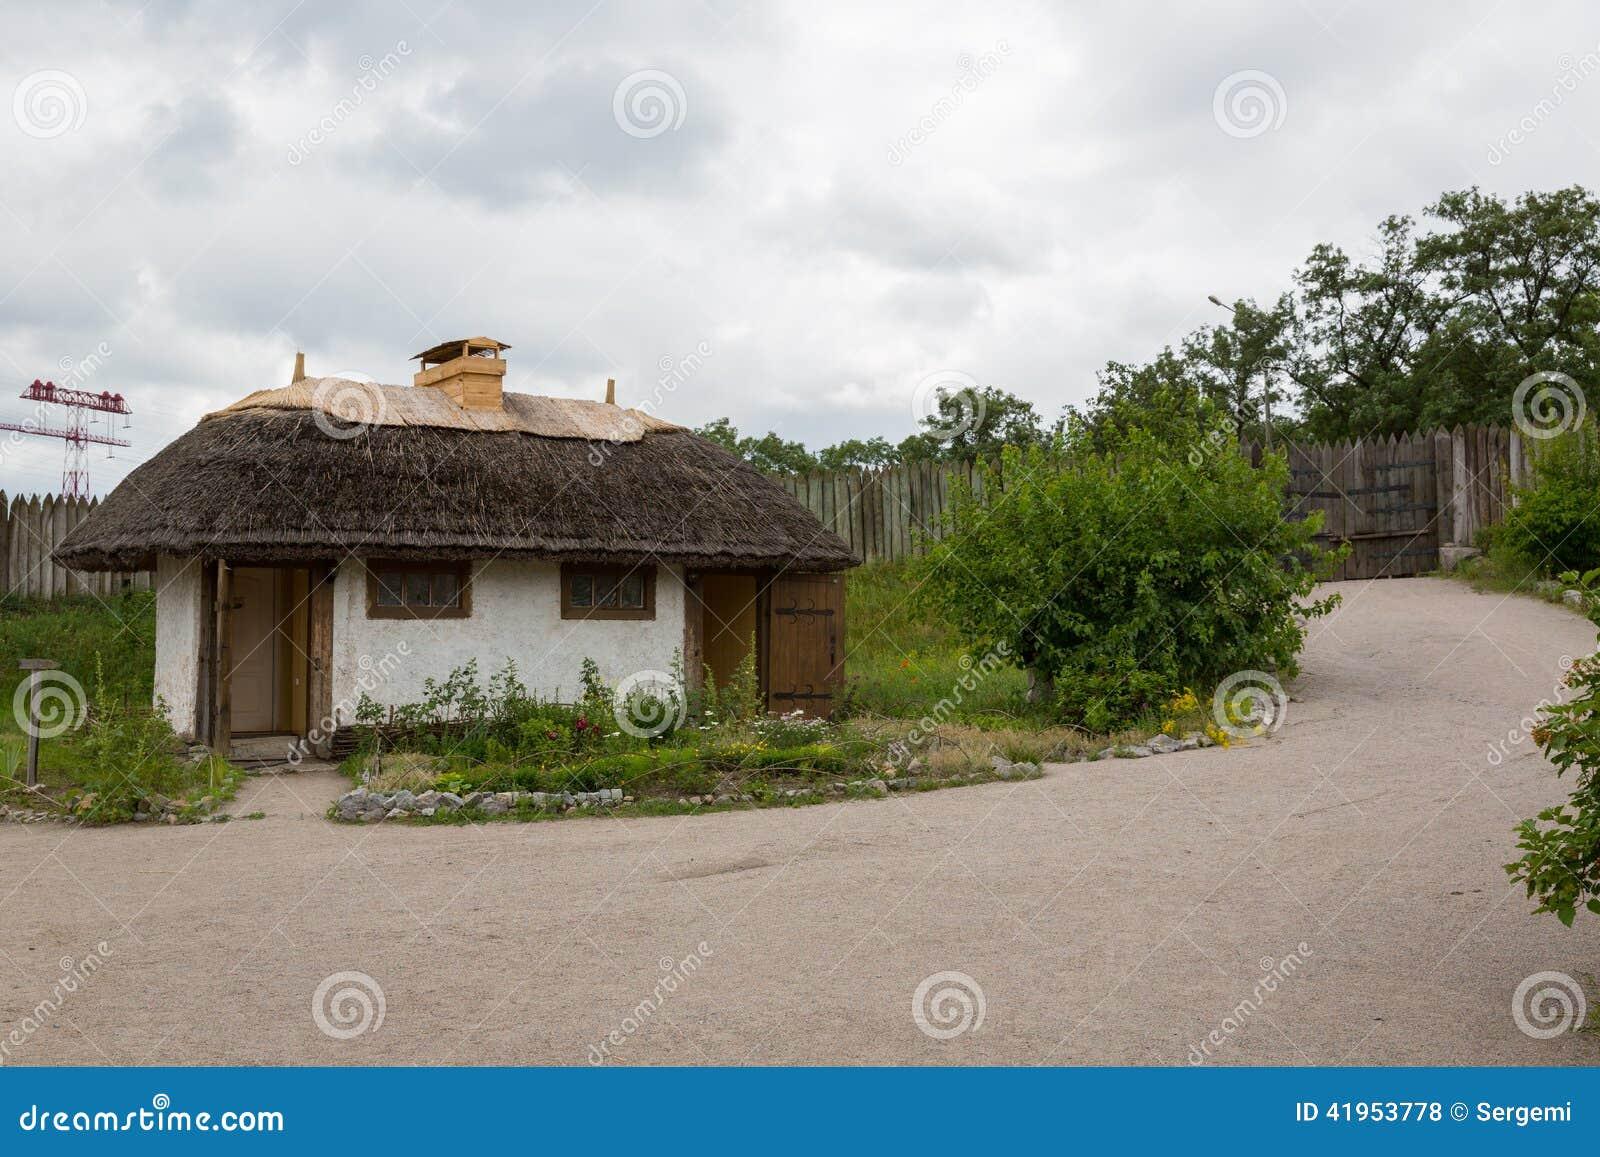 Zaporizhian Sich